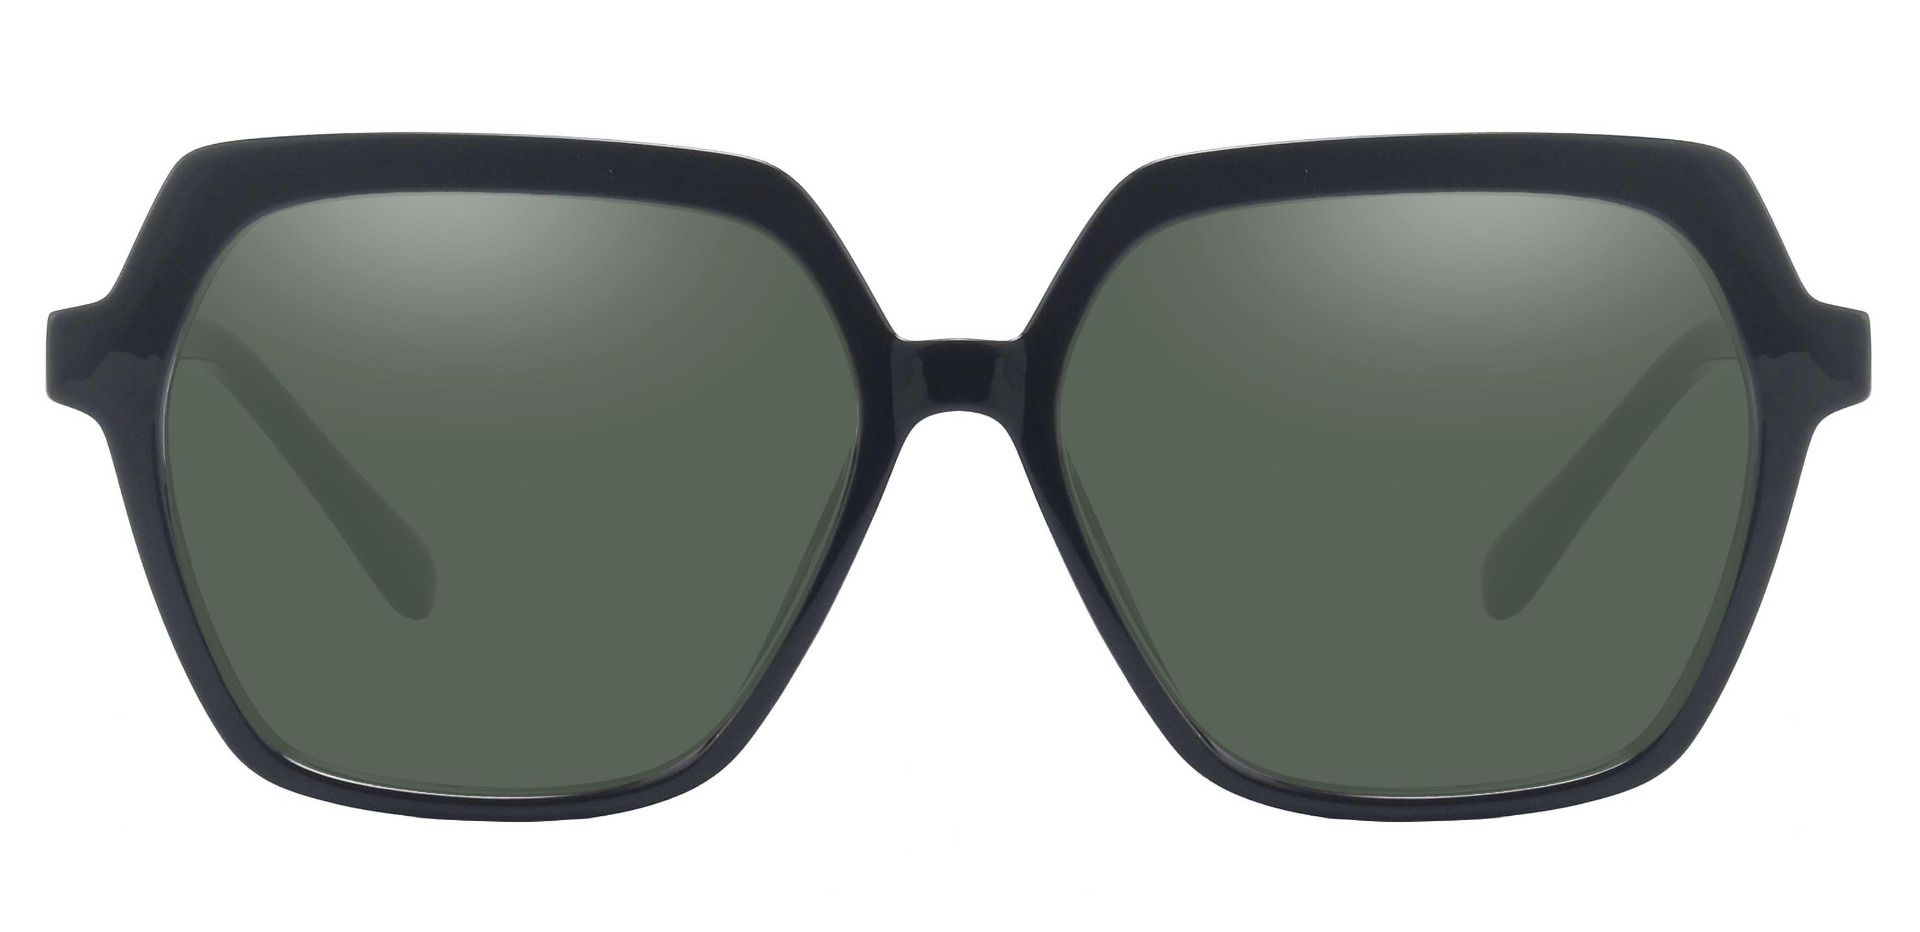 Regent Geometric Prescription Sunglasses - Black Frame With Green Lenses